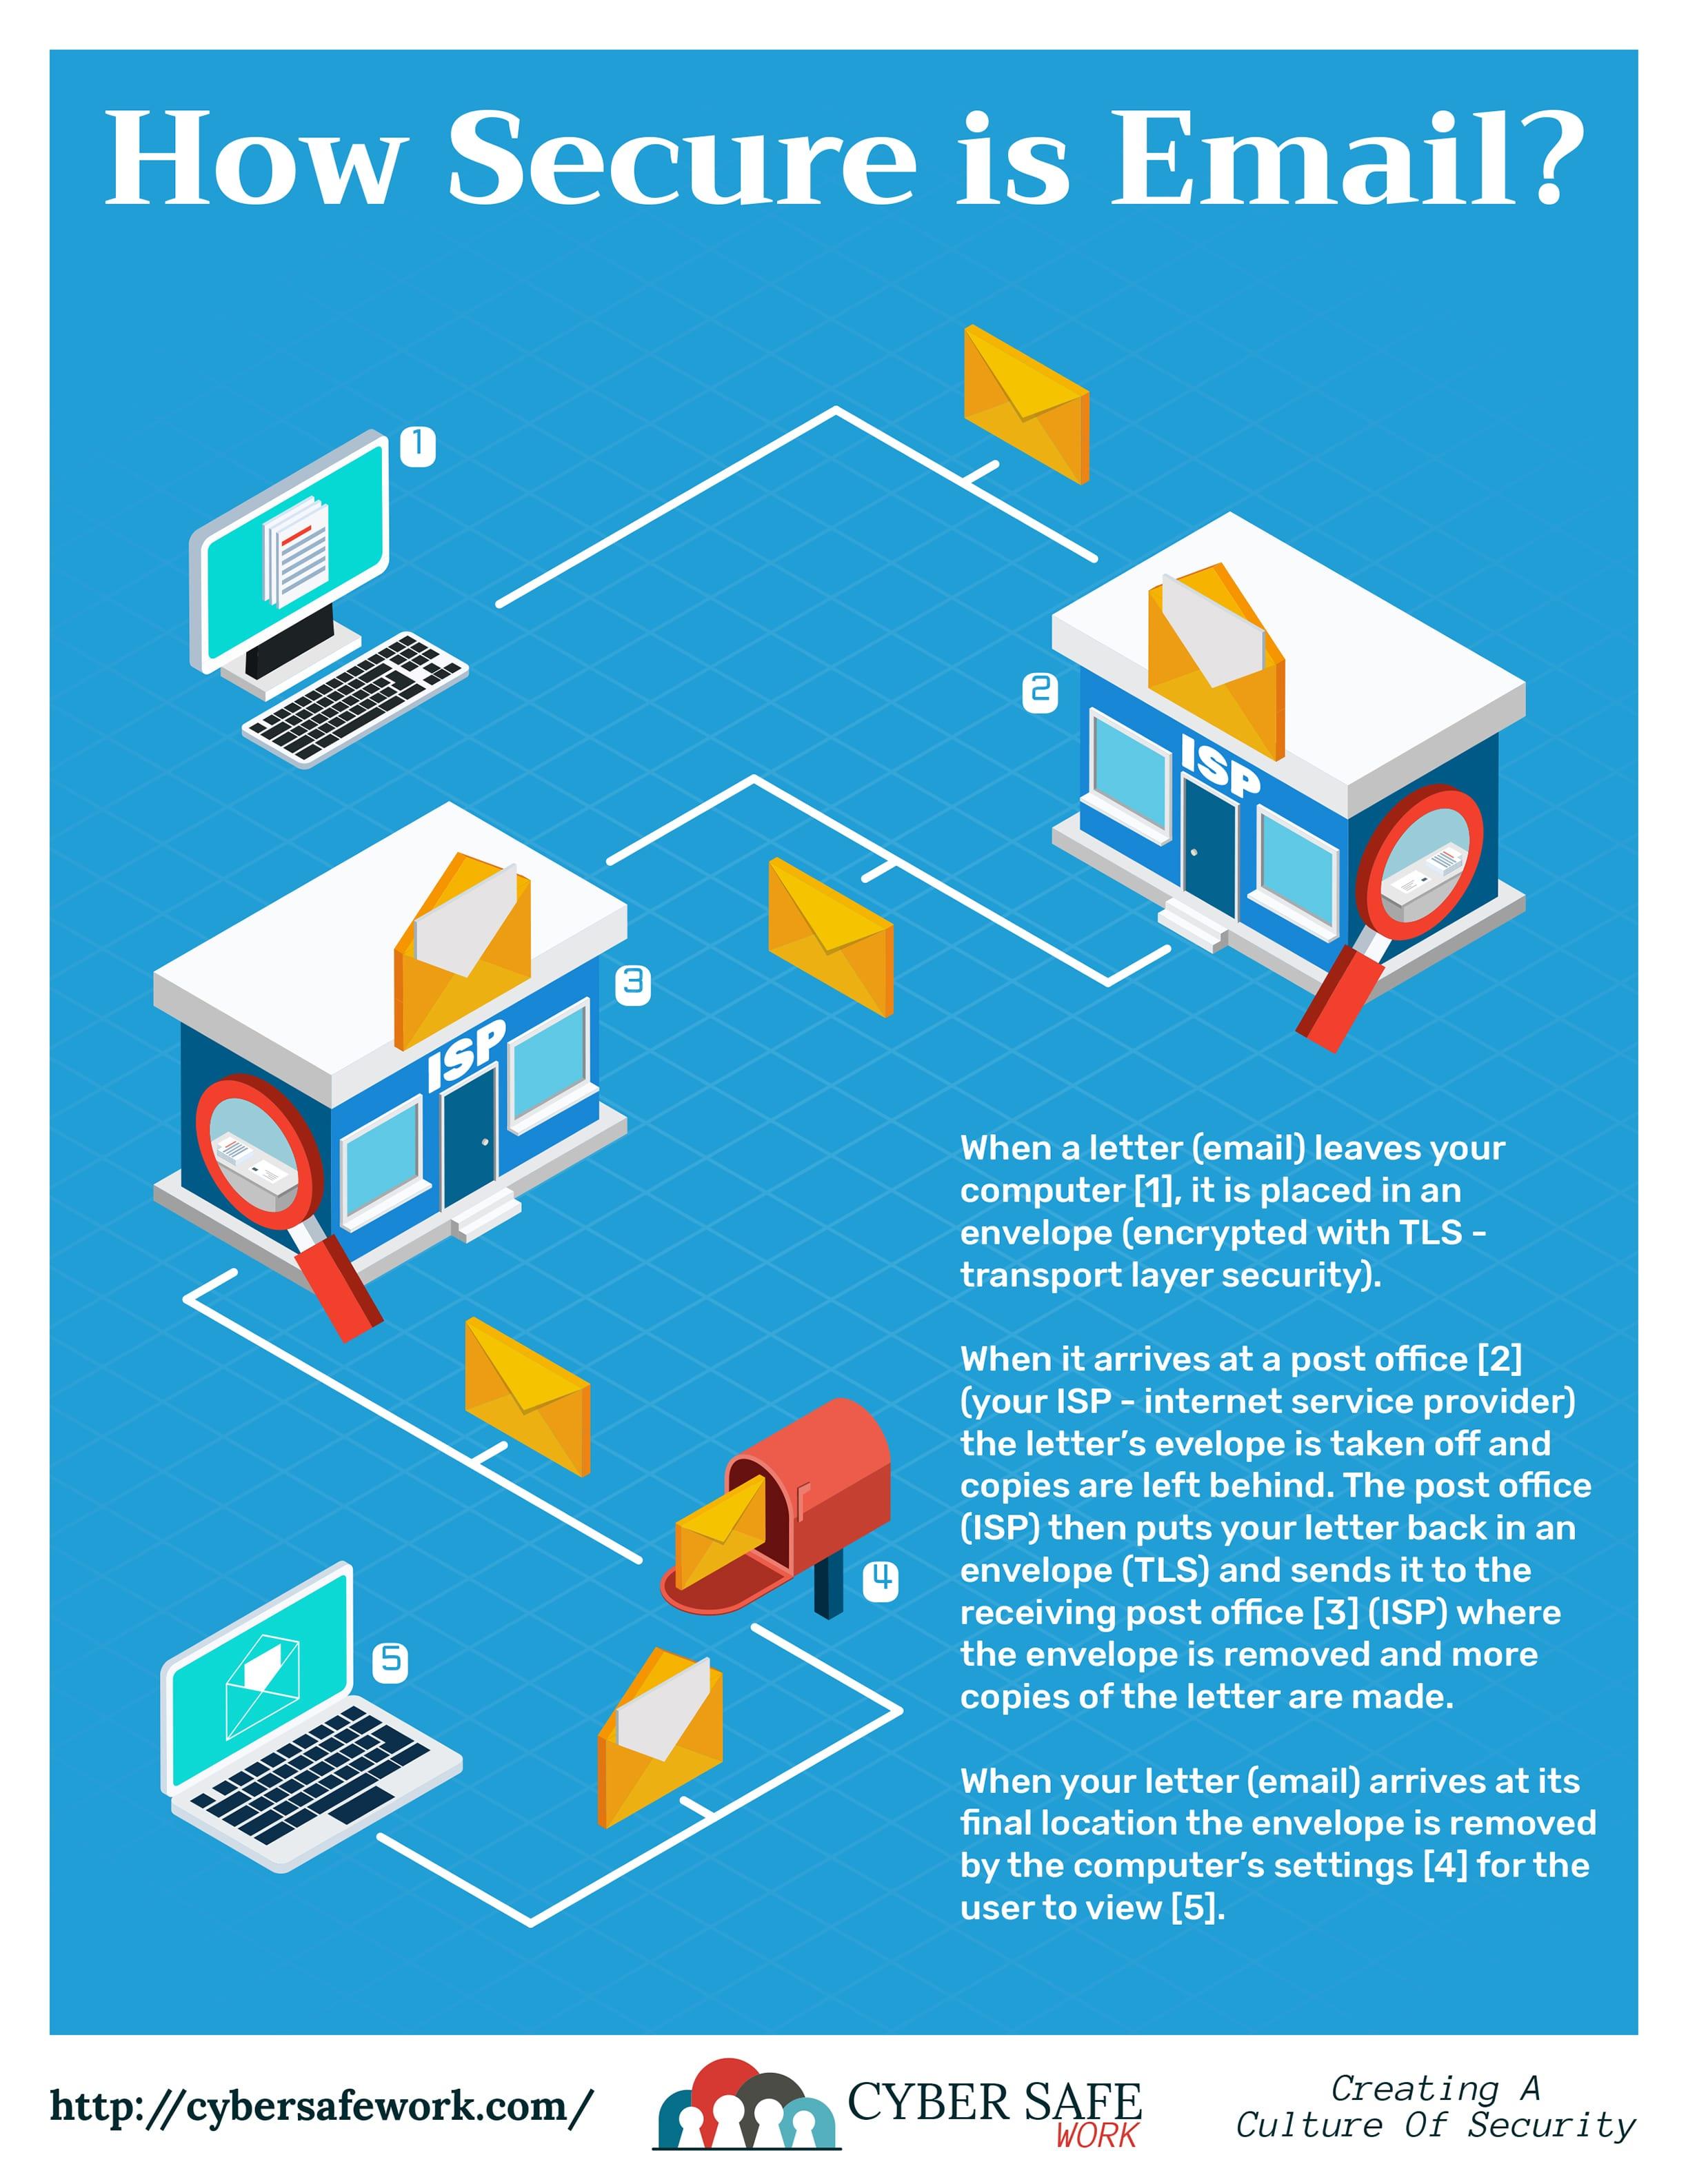 Cyber Safe Work Security Awareness Poster October 2018 -